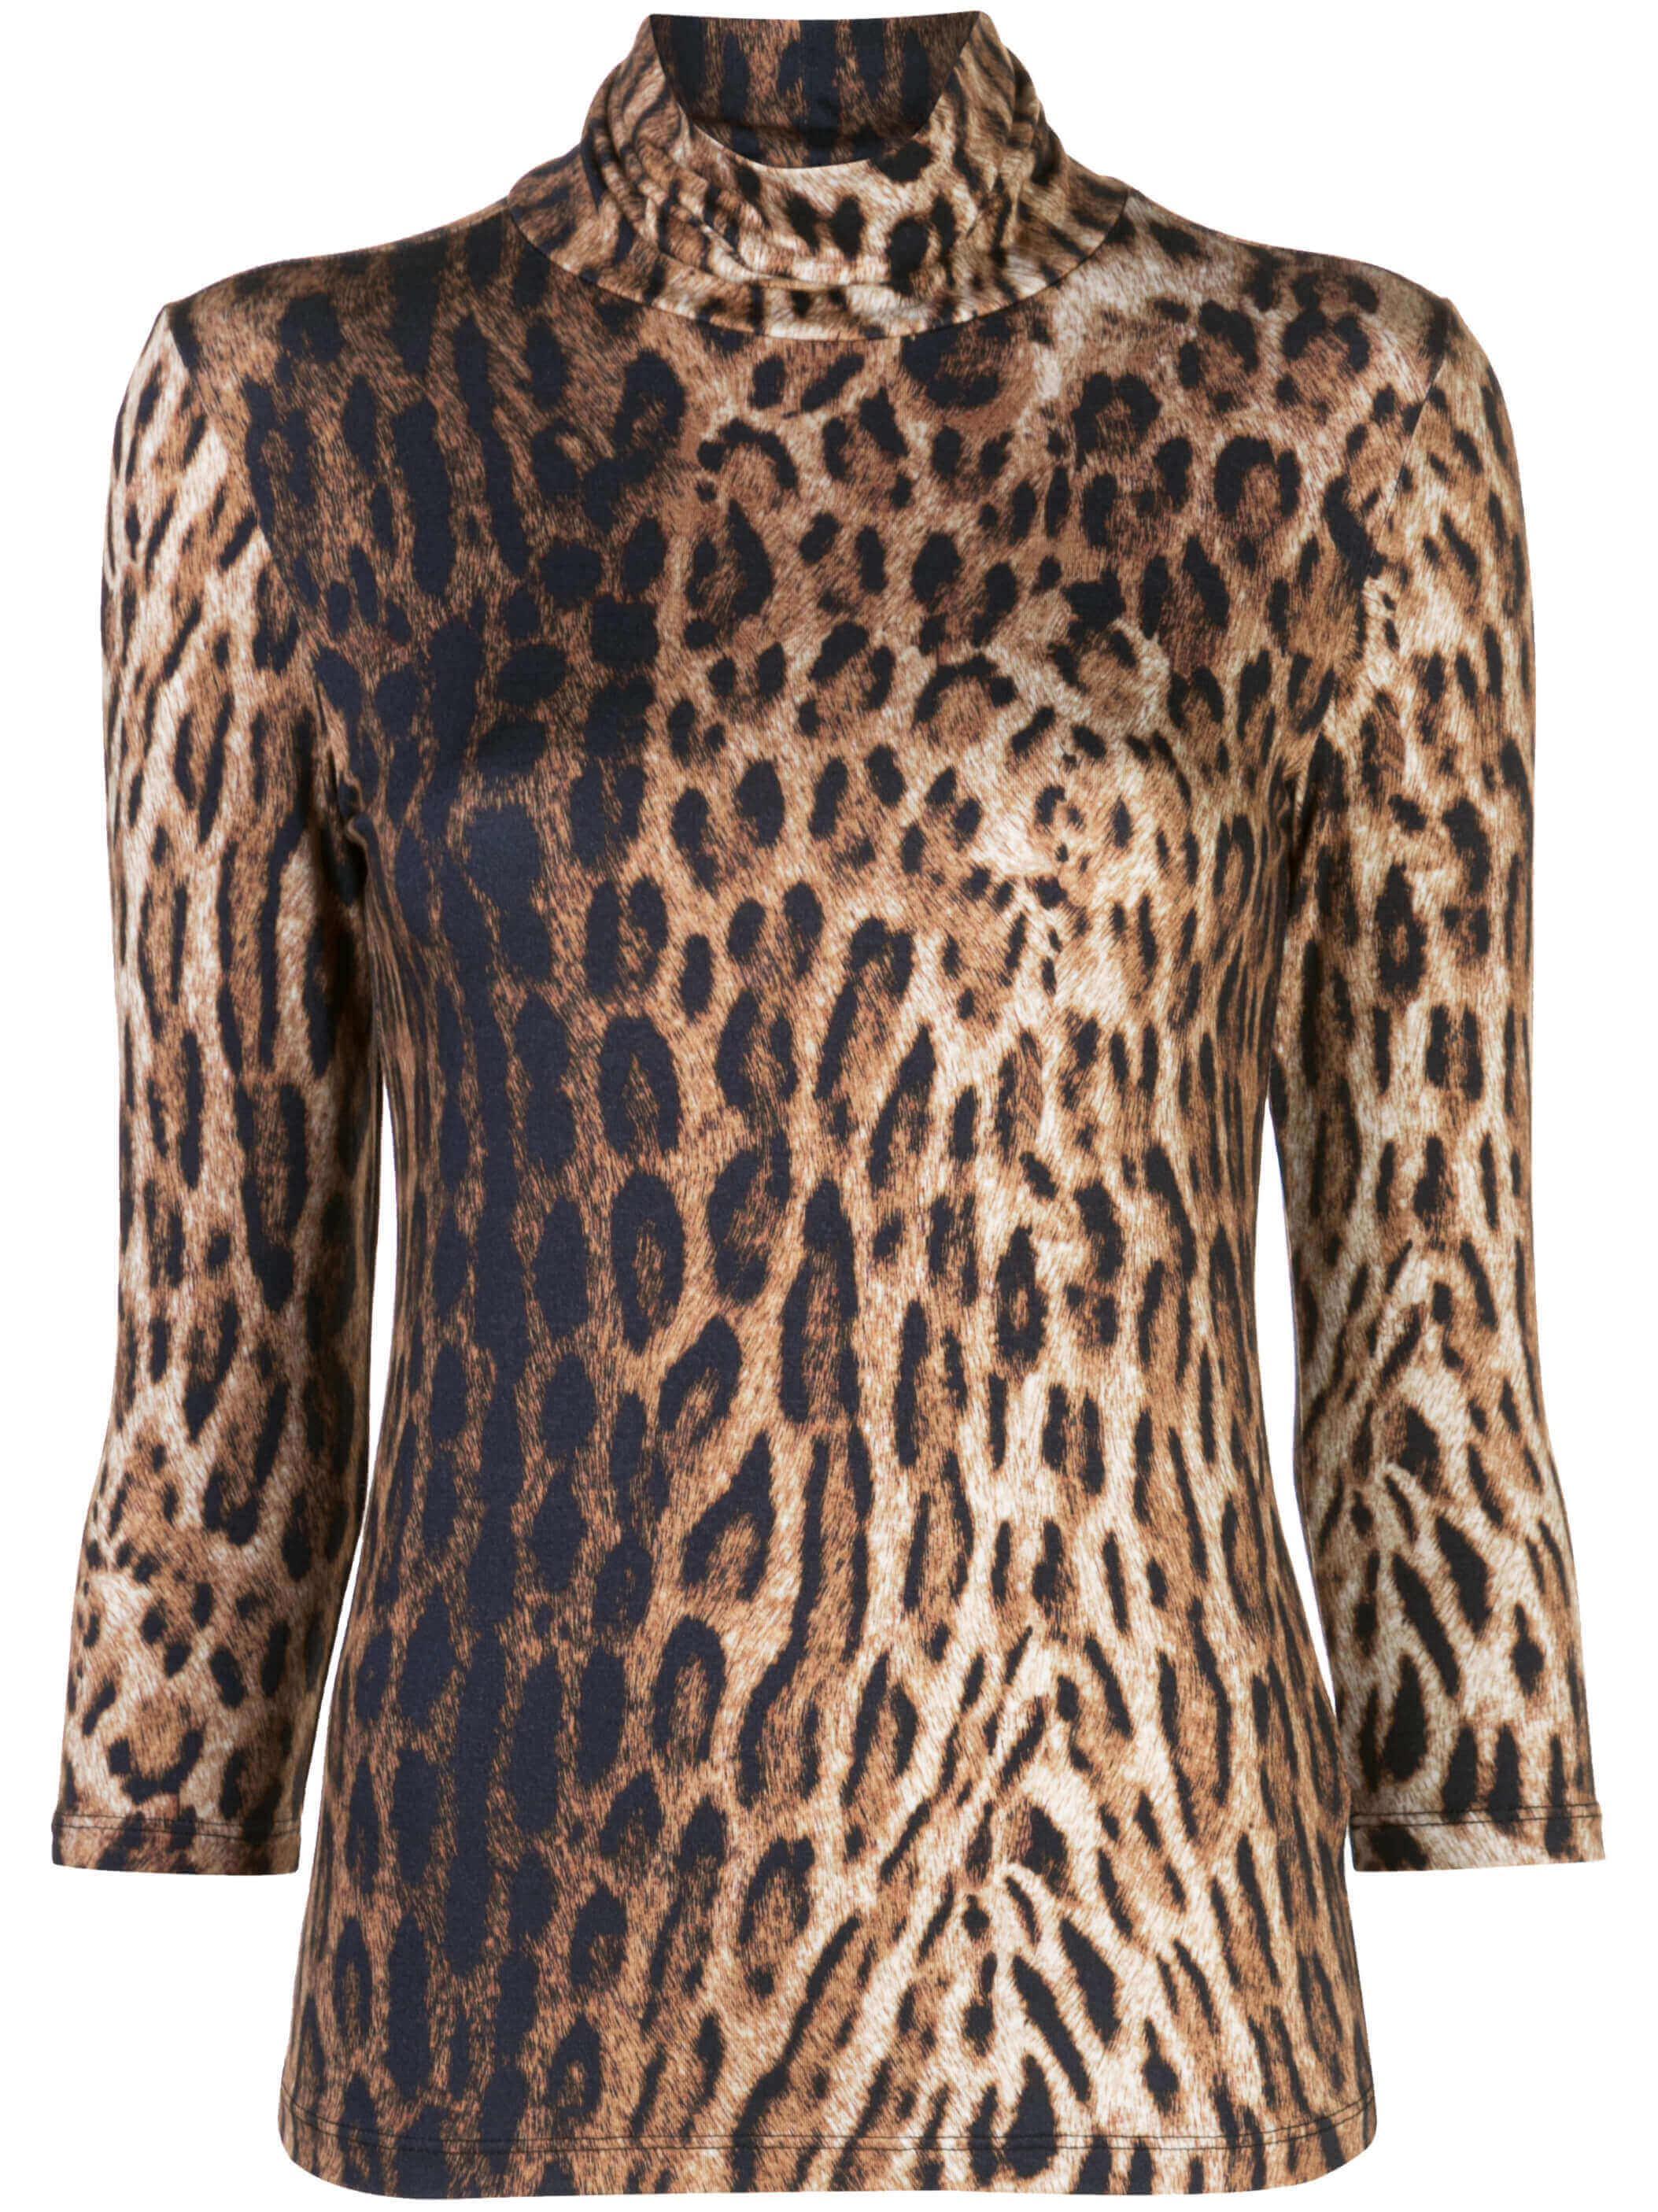 Aja Leopard Turtleneck